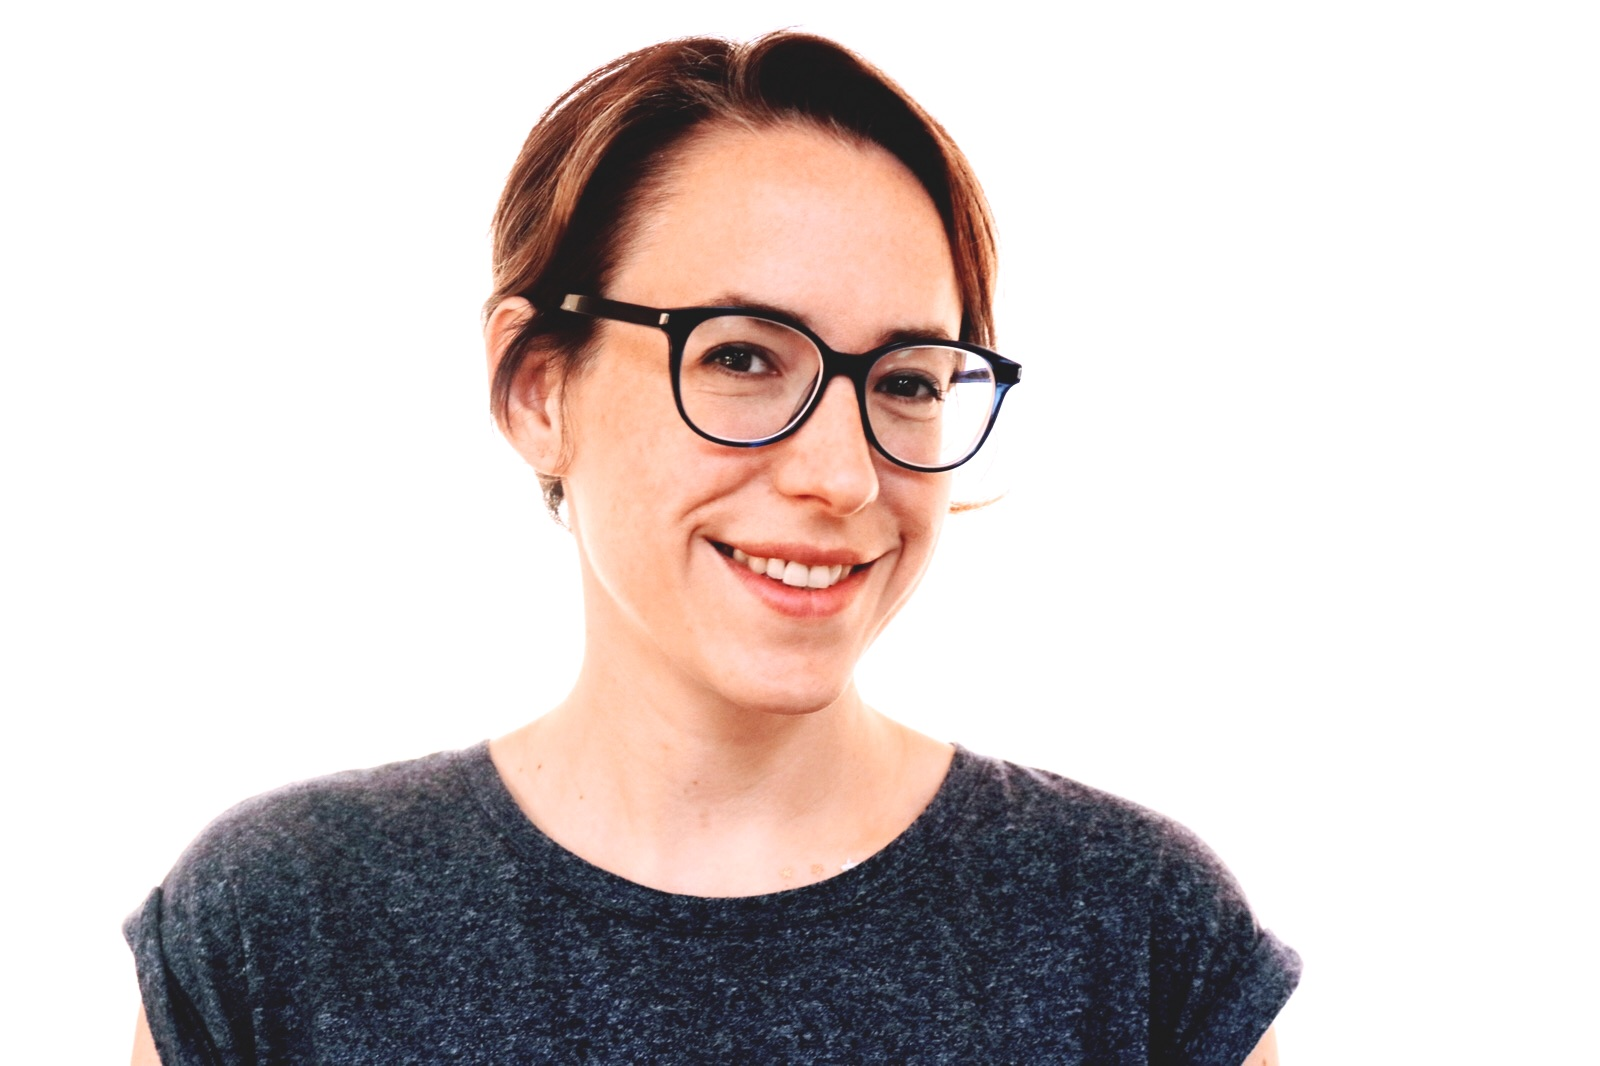 Mara Toombs, Facilitator - Transition 101